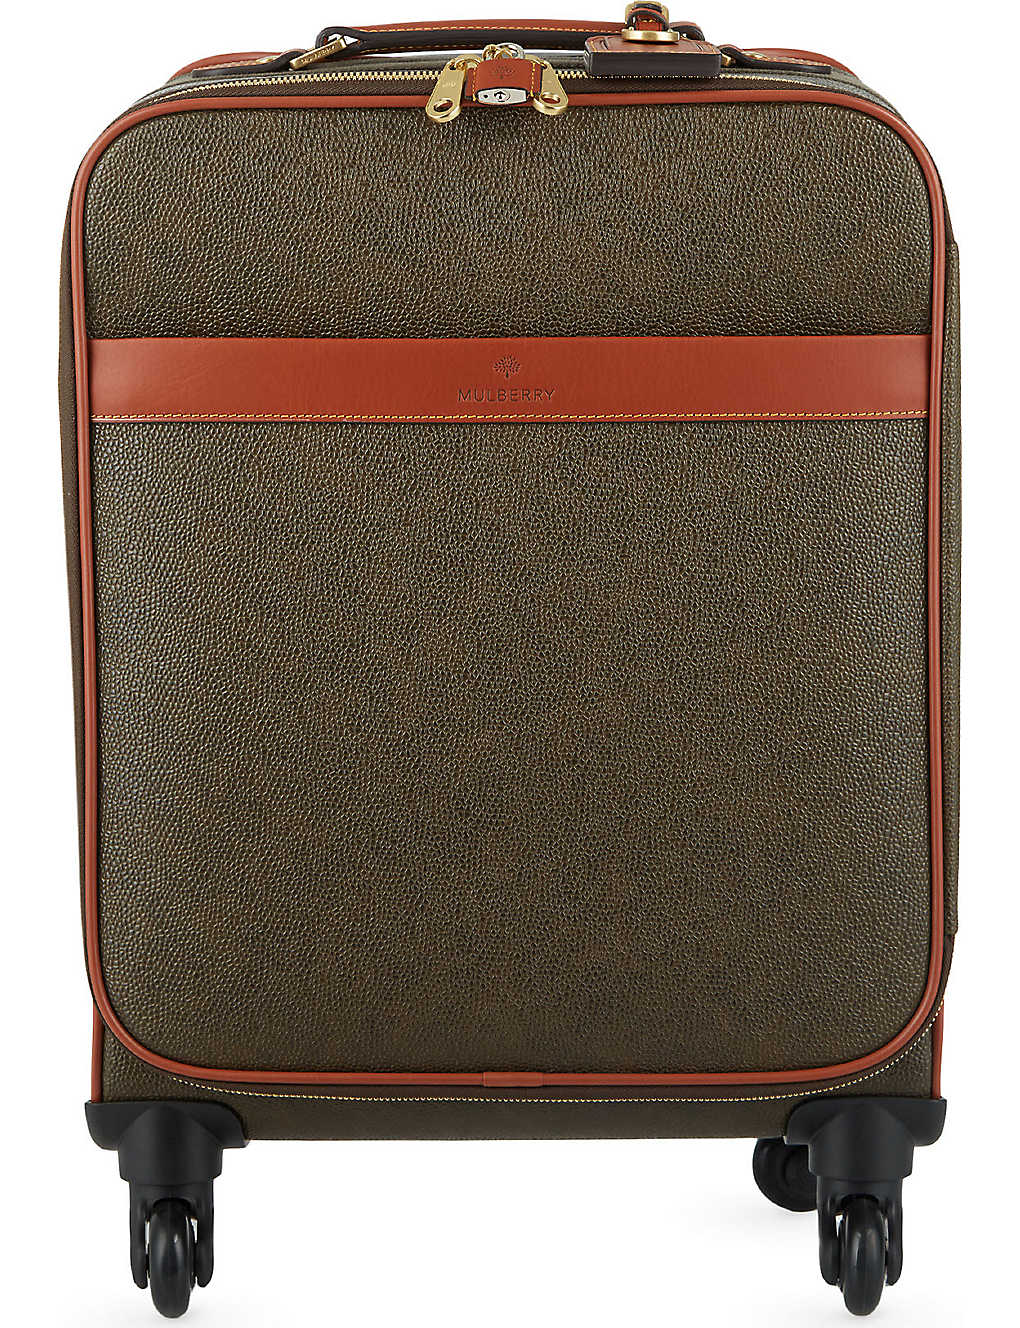 07f67b8ab2c MULBERRY - Scotchgrain four-wheel trolley suitcase 55cm | Selfridges.com